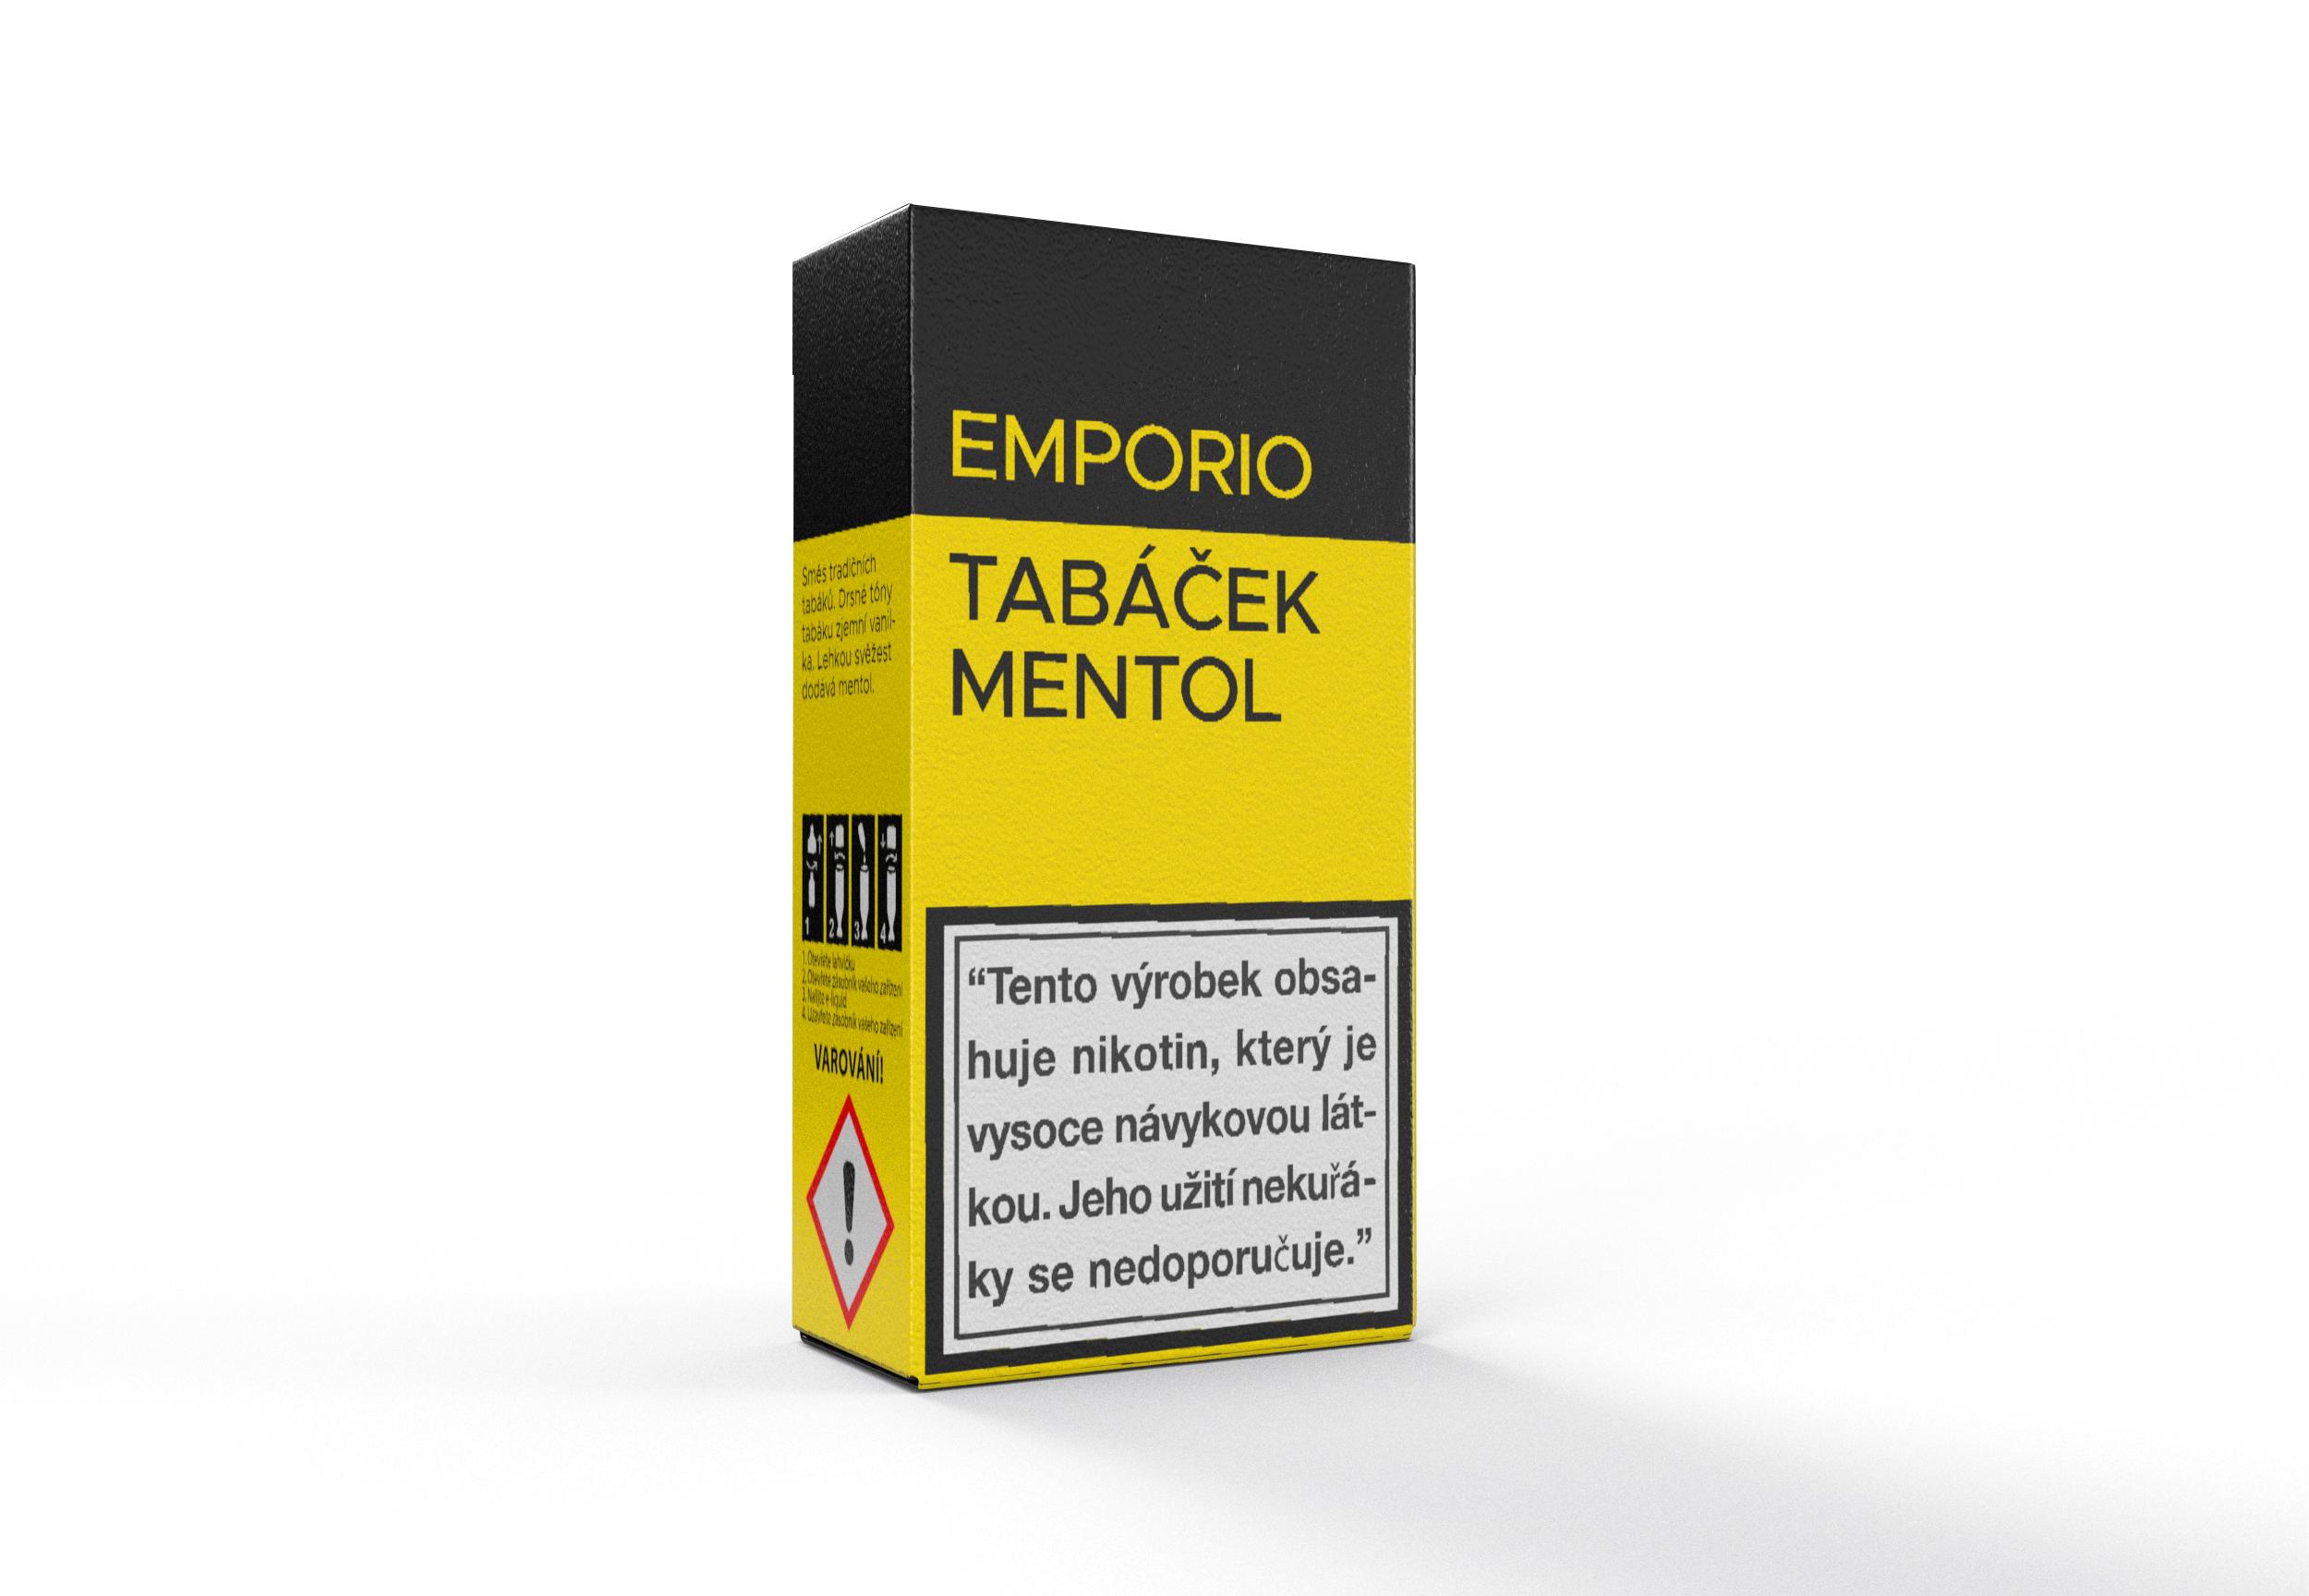 E-liquid EMPORIO Tobacco - Menthol (Tabáček - mentol) 10ml Množství nikotinu: 0mg